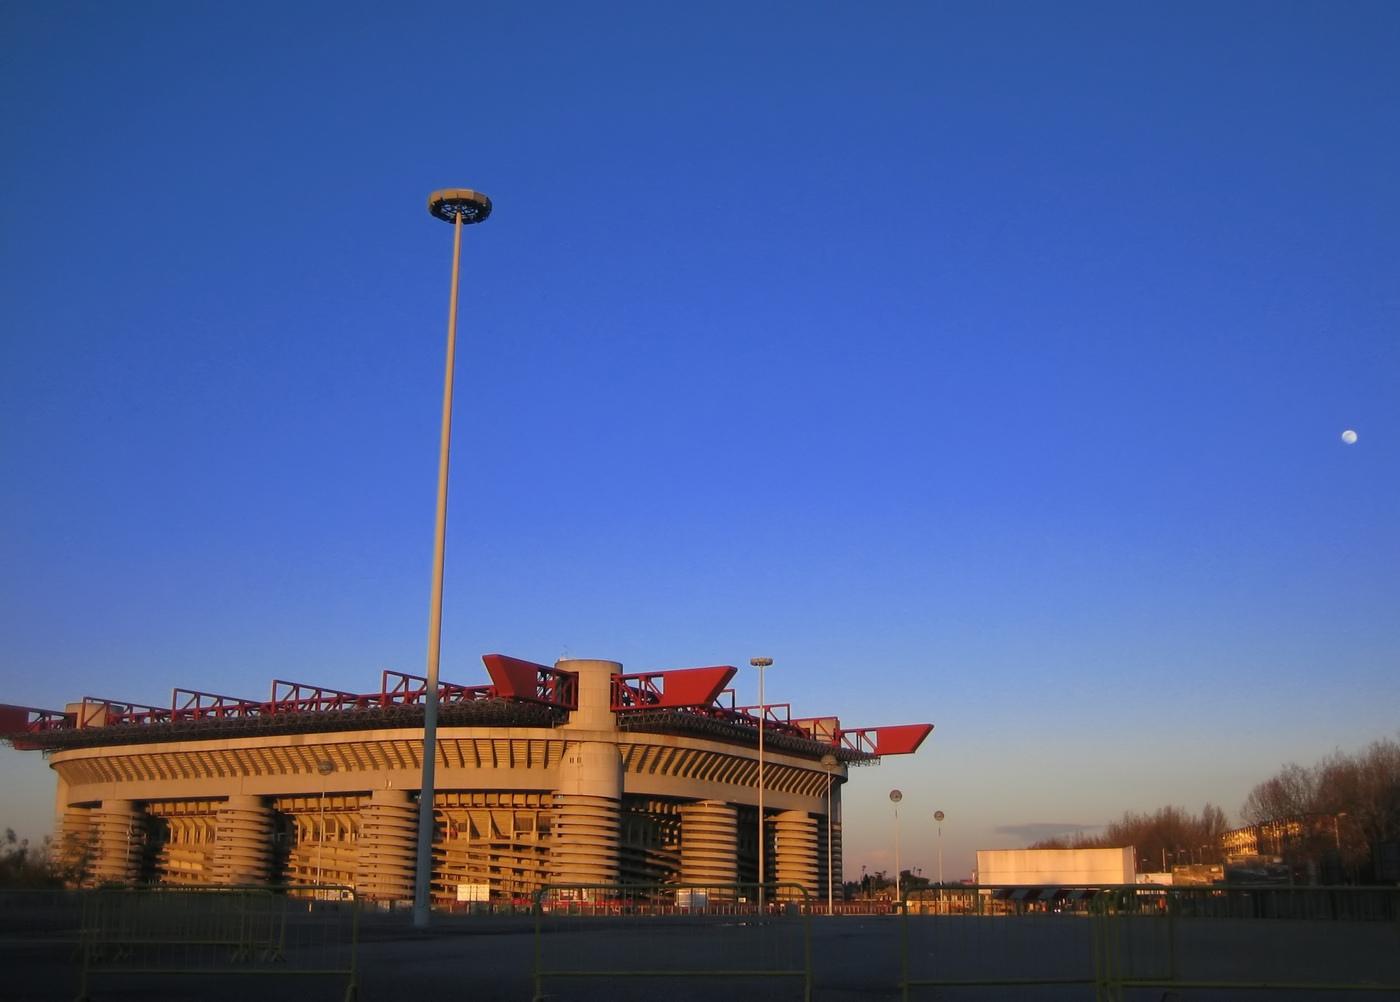 Stadio_San_Siro_-_Giuseppe_Meazza,_Milano